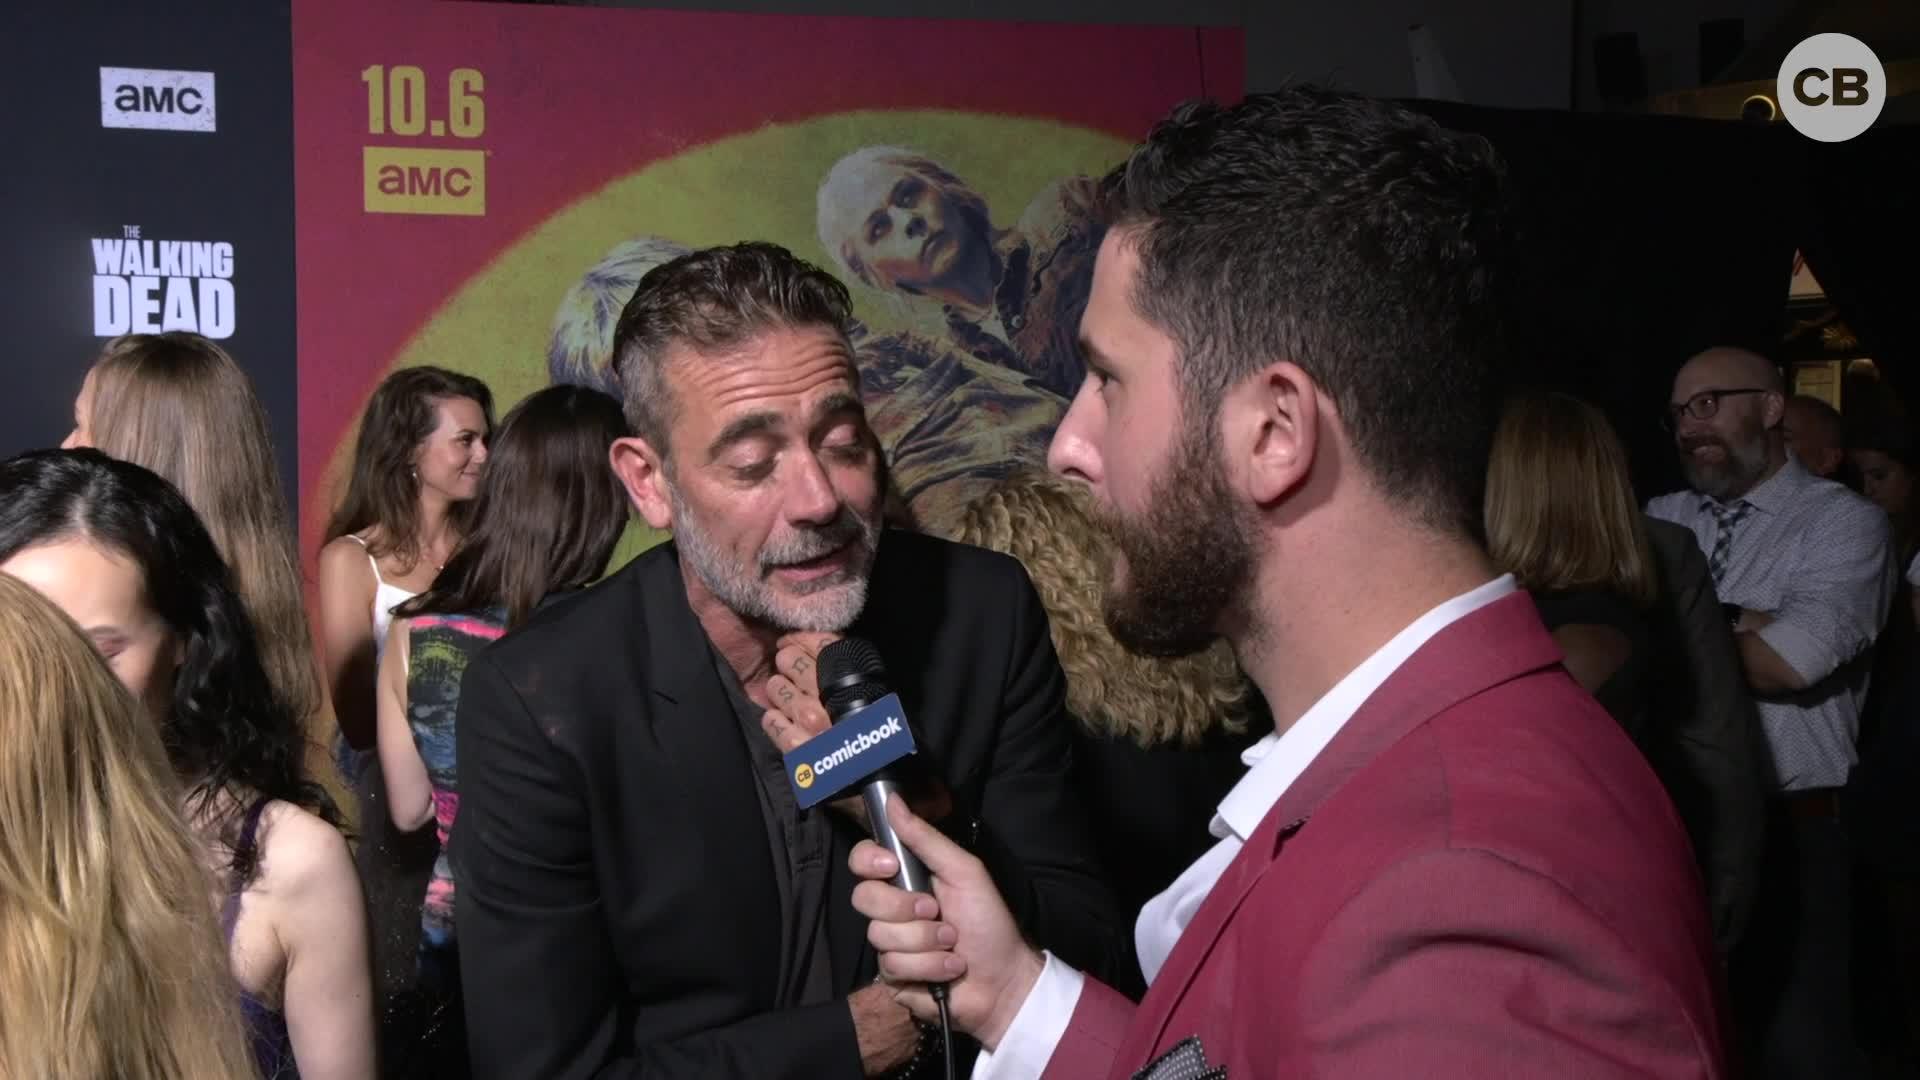 Jeffrey Dean Morgan - THE WALKING DEAD Season 10 Red Carpet Premiere Interview screen capture